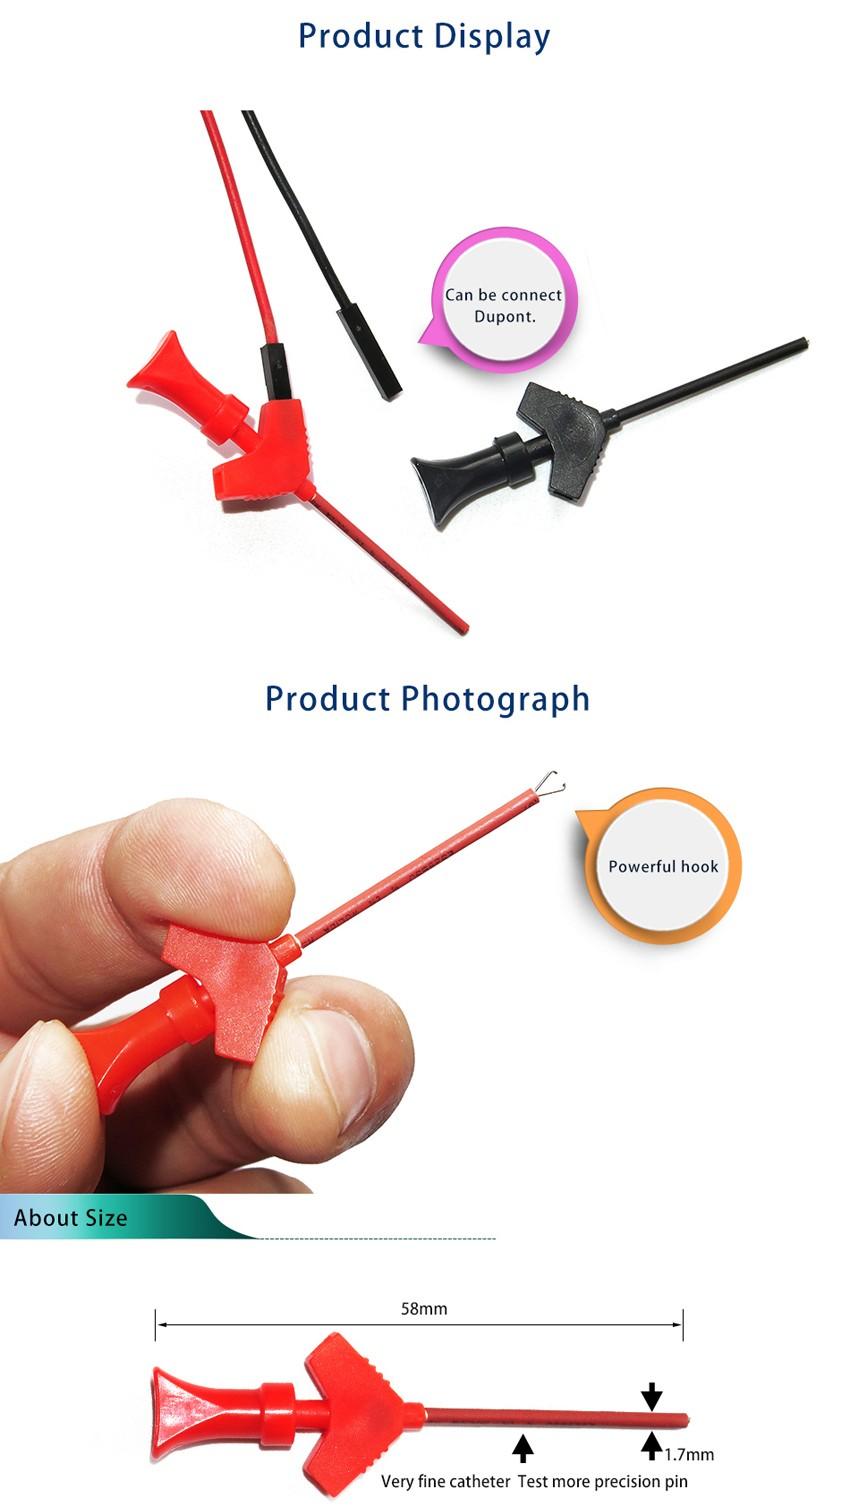 DANIU P5003 10Pcs Mini Grabber SMD IC Test Hook Clip Jumper Probe Logic Analyzer Testing Accessories